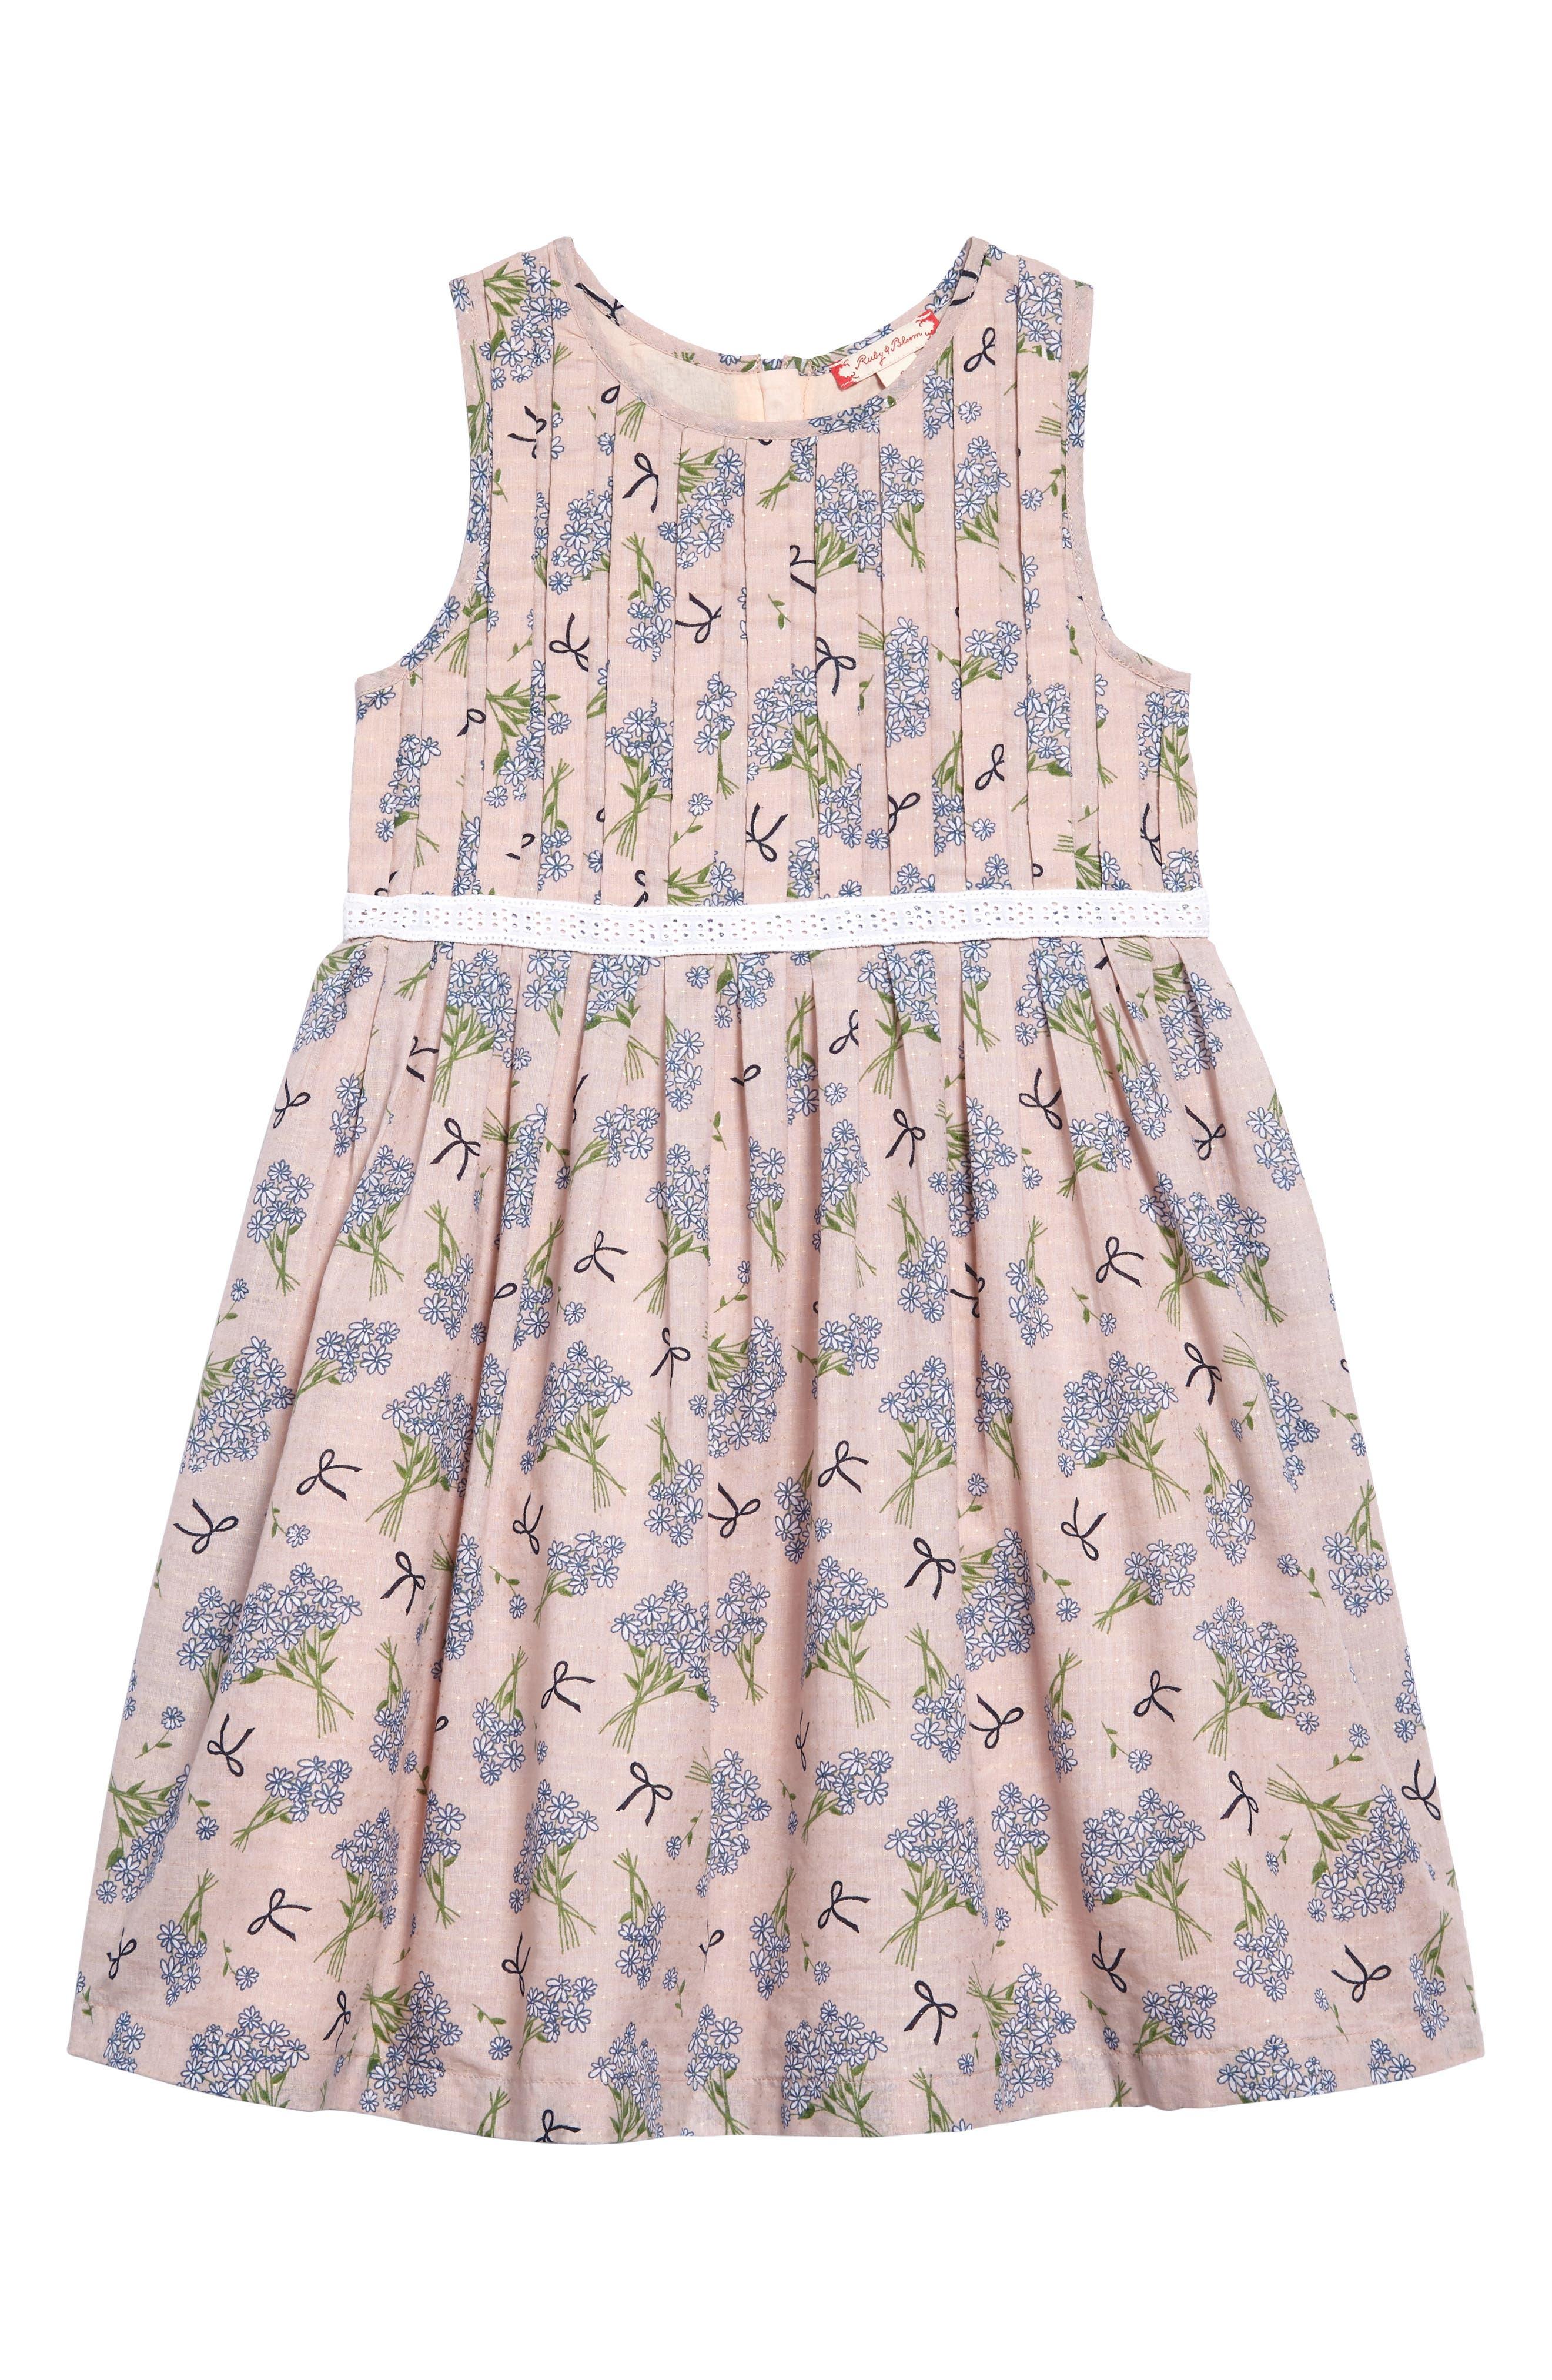 Ruby & Bloom Dobby Floral Pleat Dress (Toddler Girls, Little Girls & Big Girls)